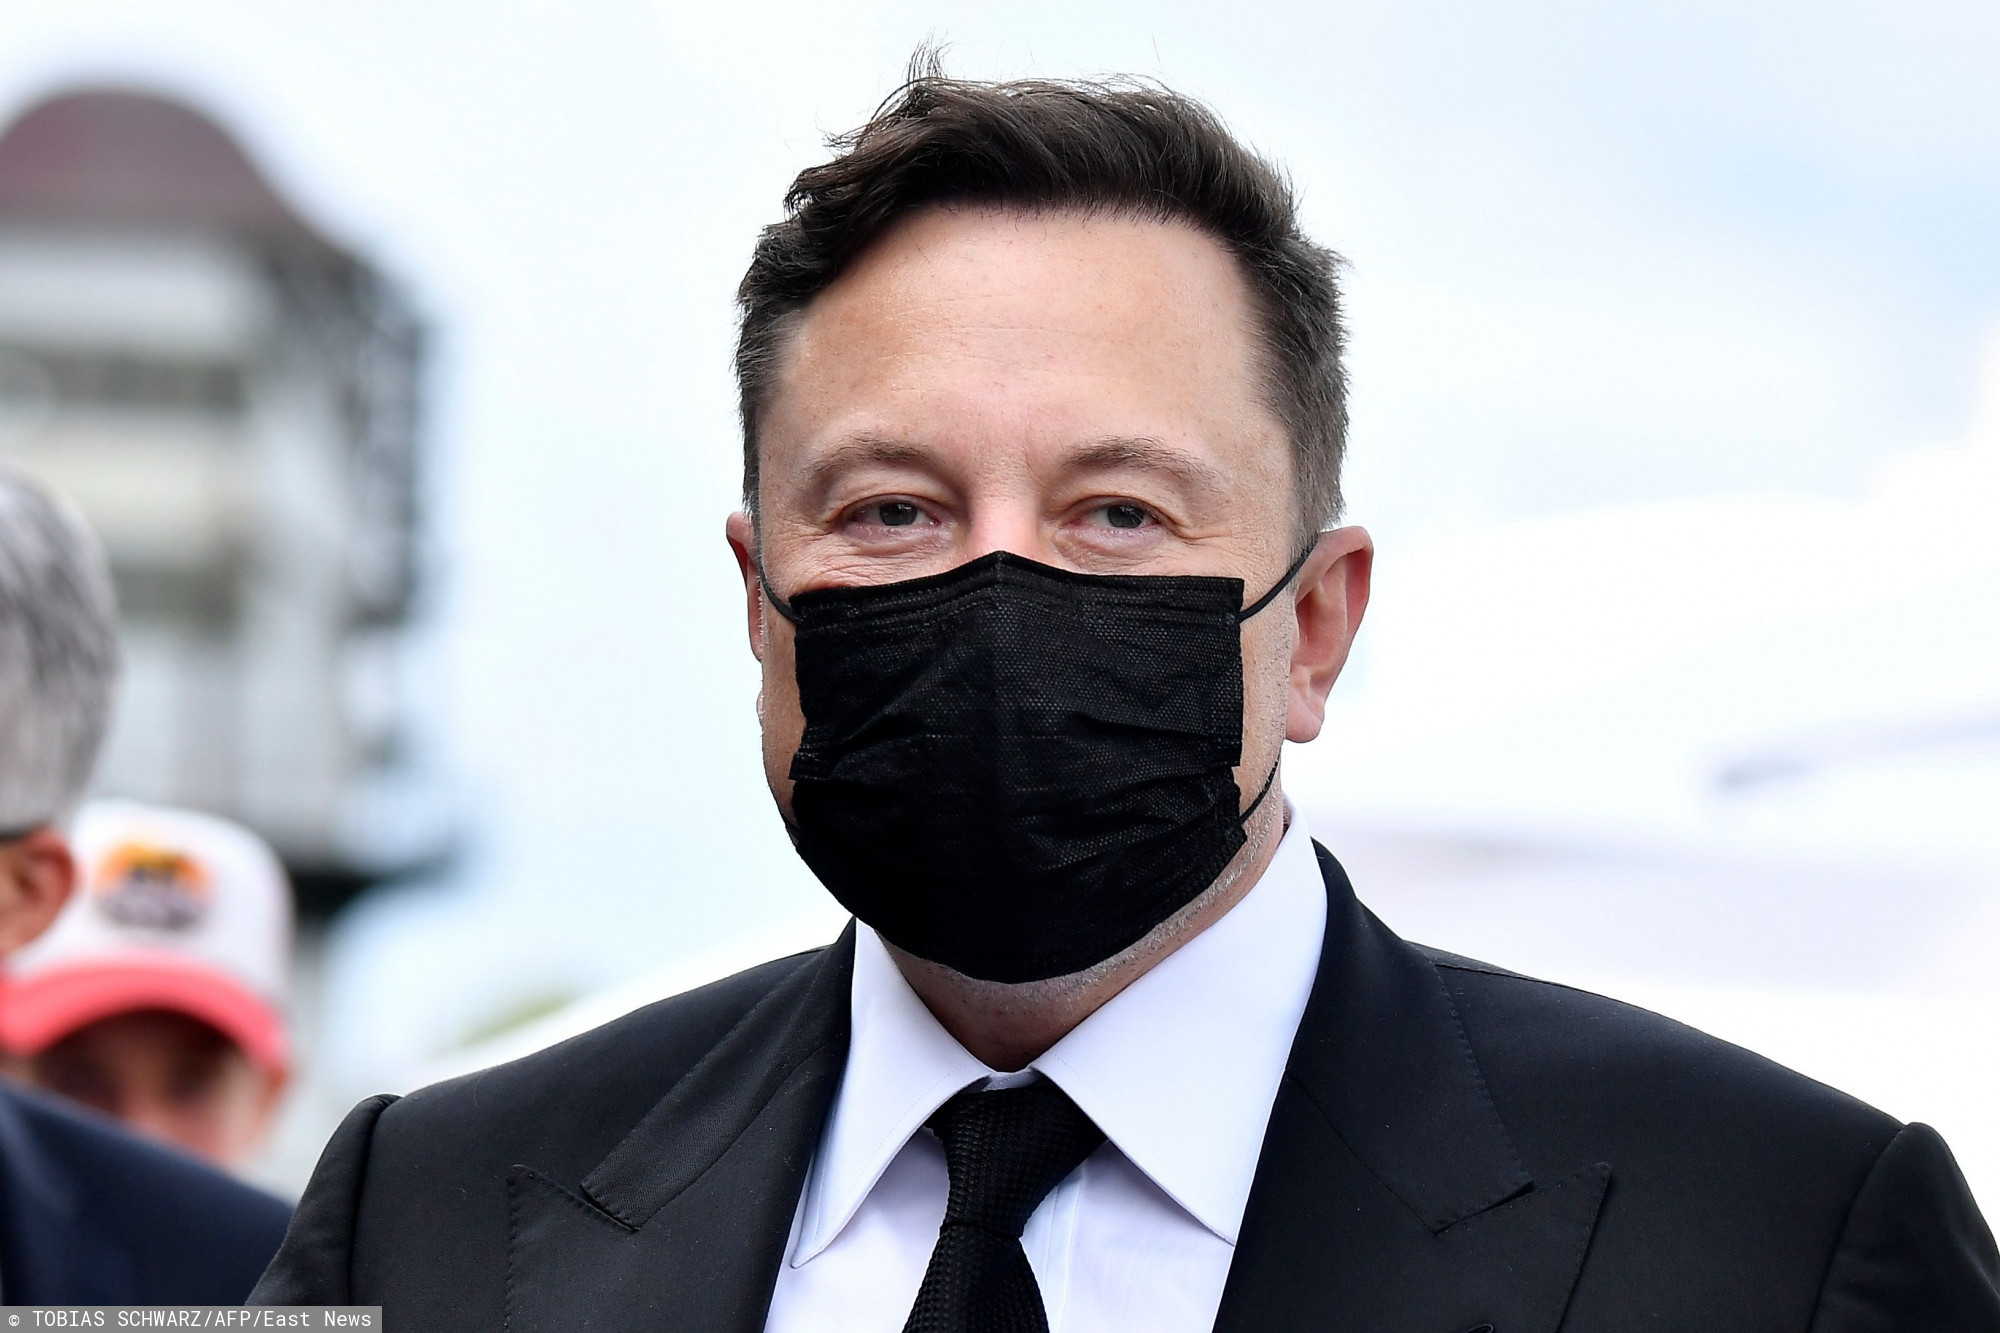 Elon Musk ma koronawirusa